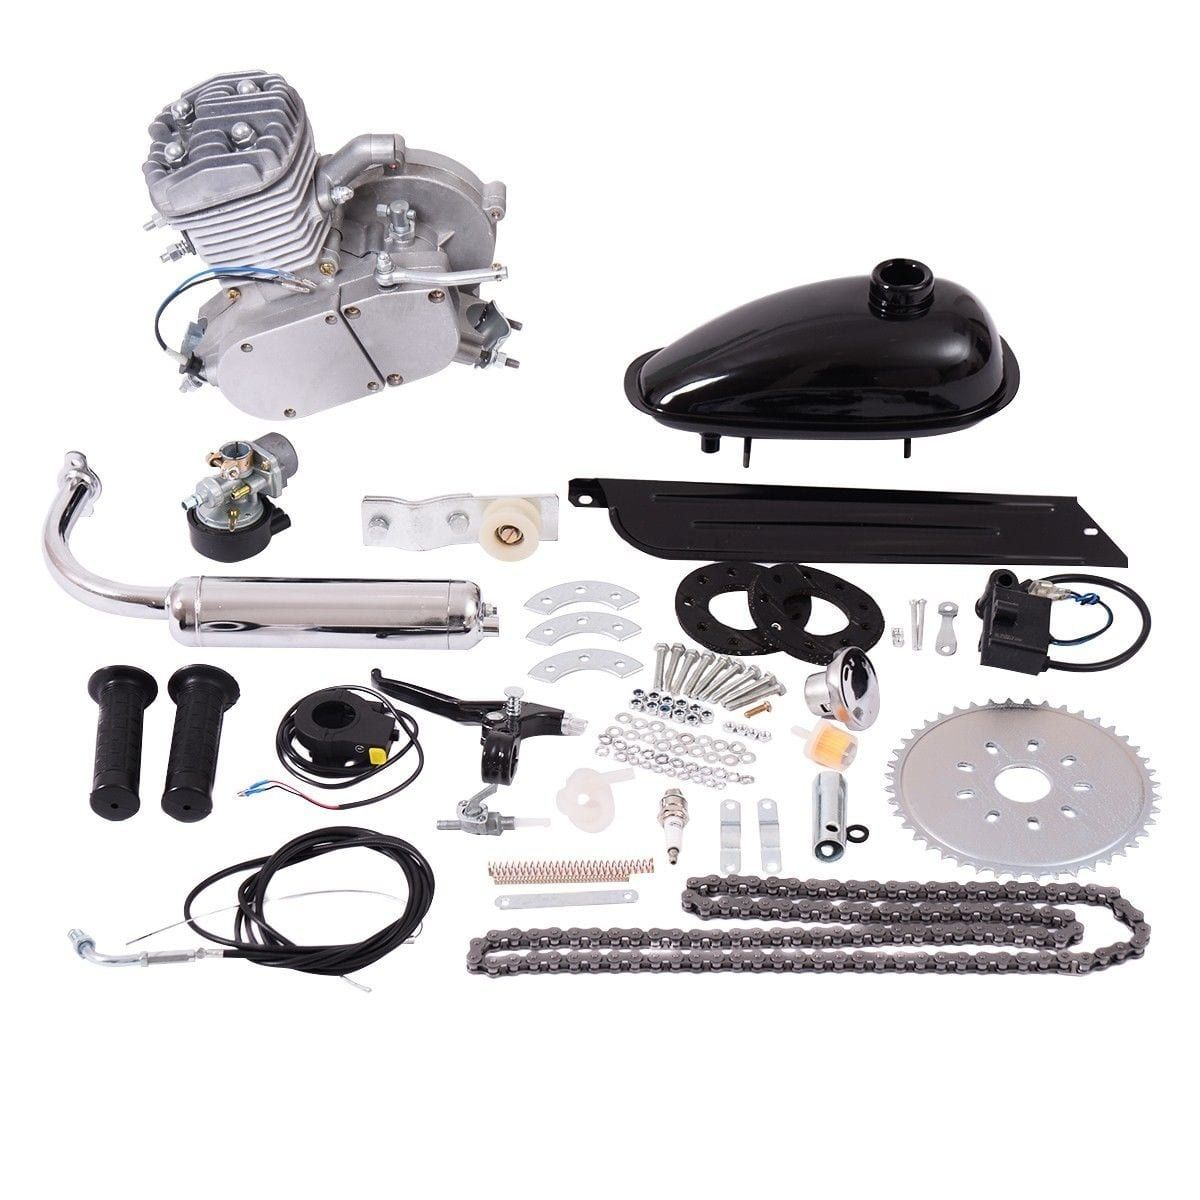 Costway 80cc 2Stroke Bicycle Gasoline Engine Motor Kit